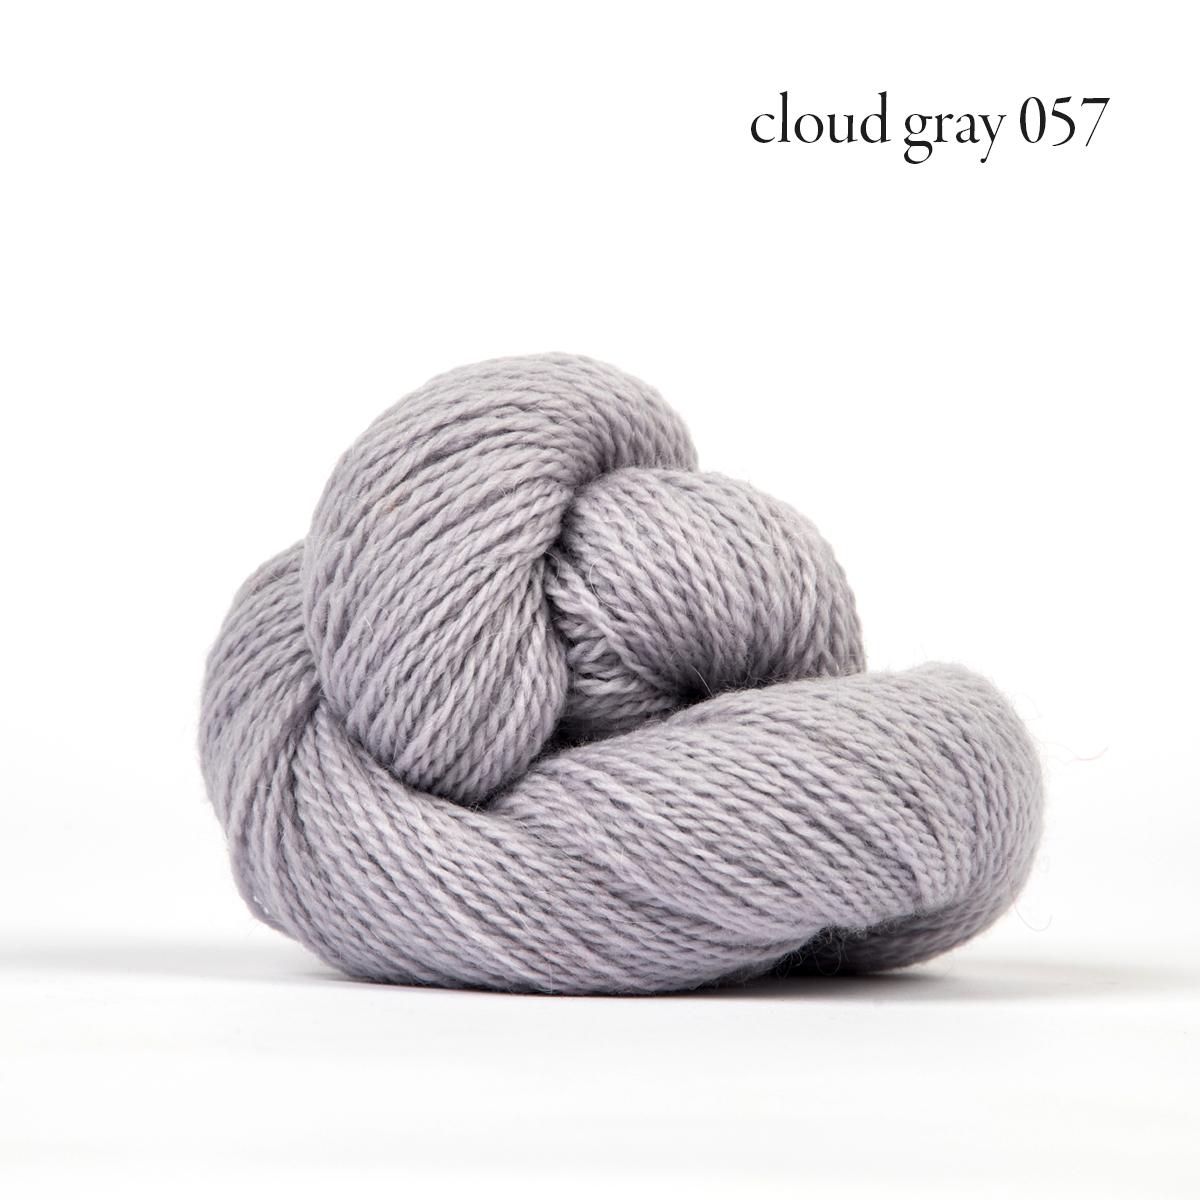 Andorra Cloud gray.jpg